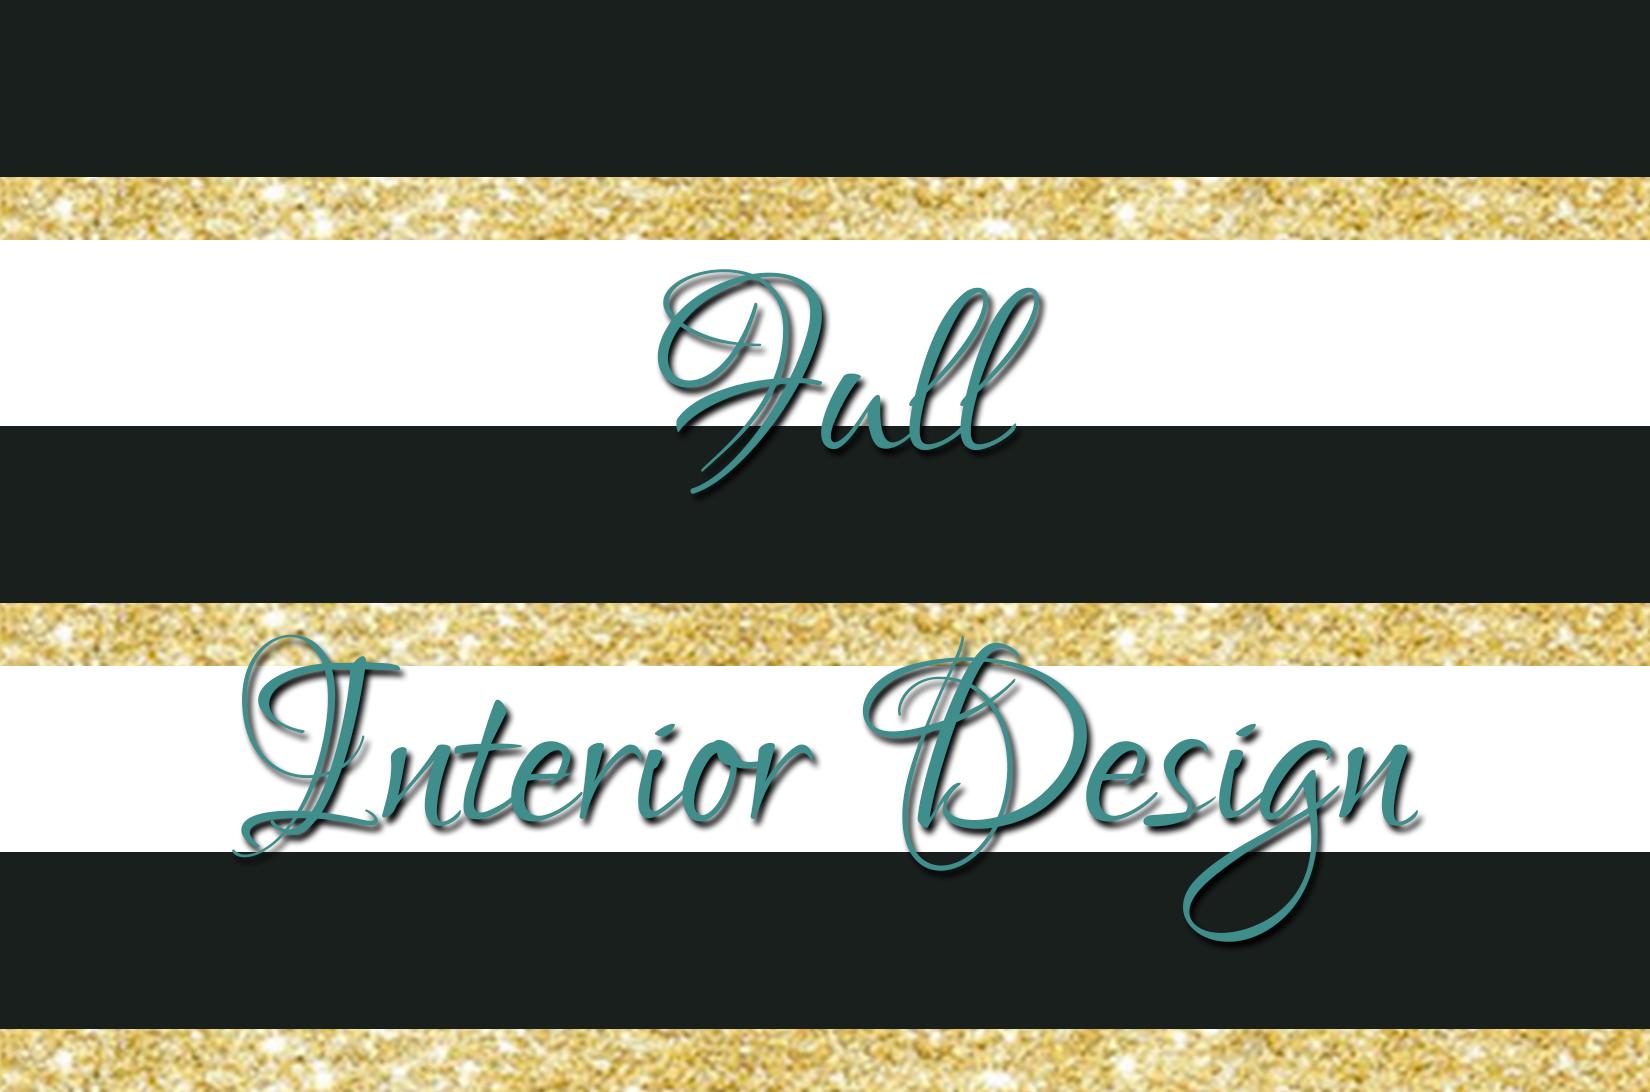 Baby-Nursery-Toddler-Teen-Bedroom-Playroom-Amelias-Decorating-and-Design-Interior-Designer-New-Jersey.jpg